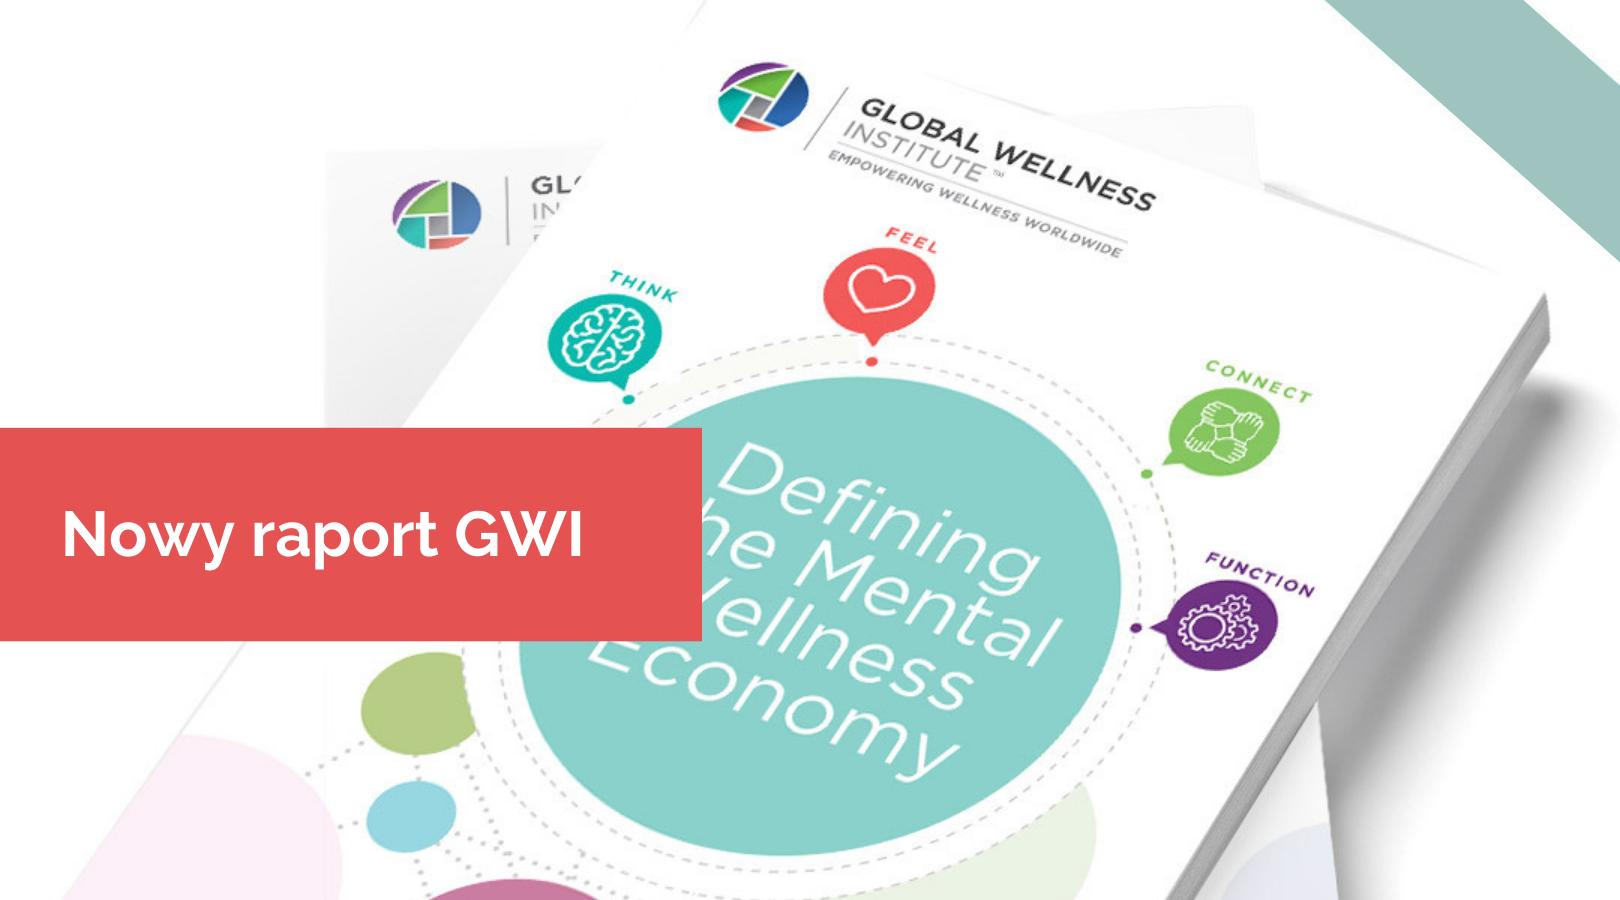 Mental Wellness. Nowy raport GWI